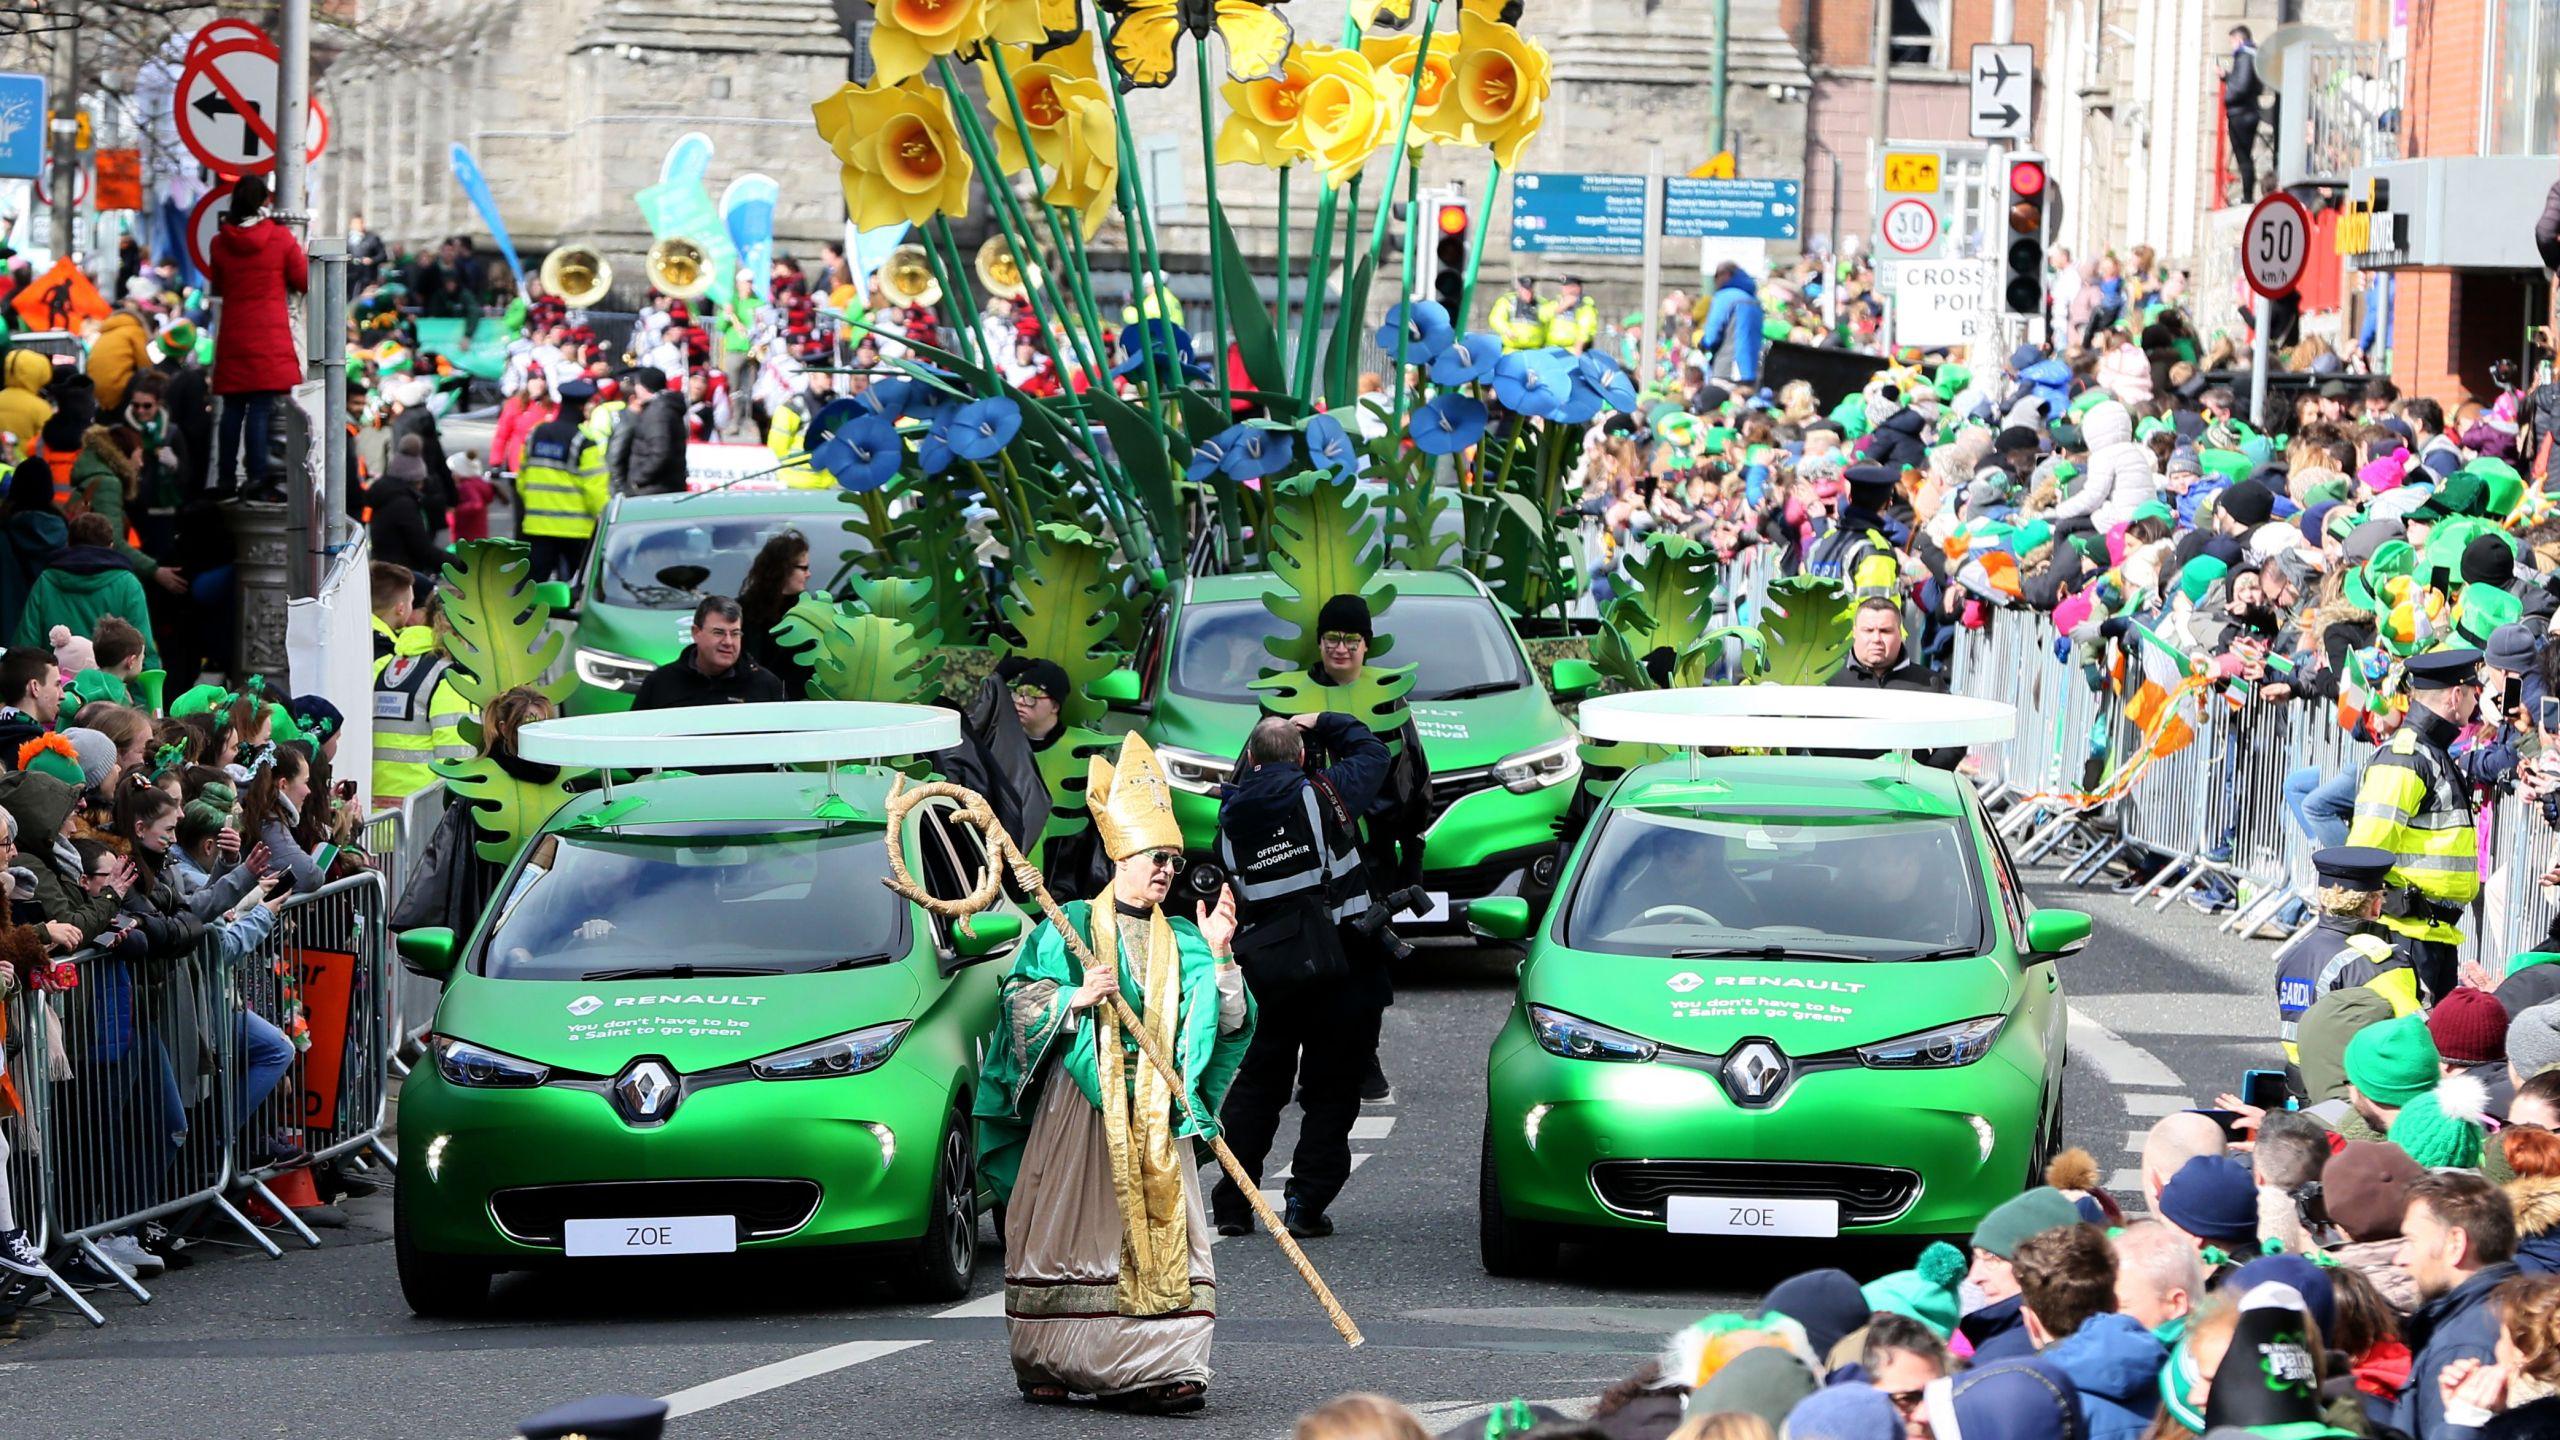 Ireland cancels St Patricks Day parades over coronavirus fears 2560x1440